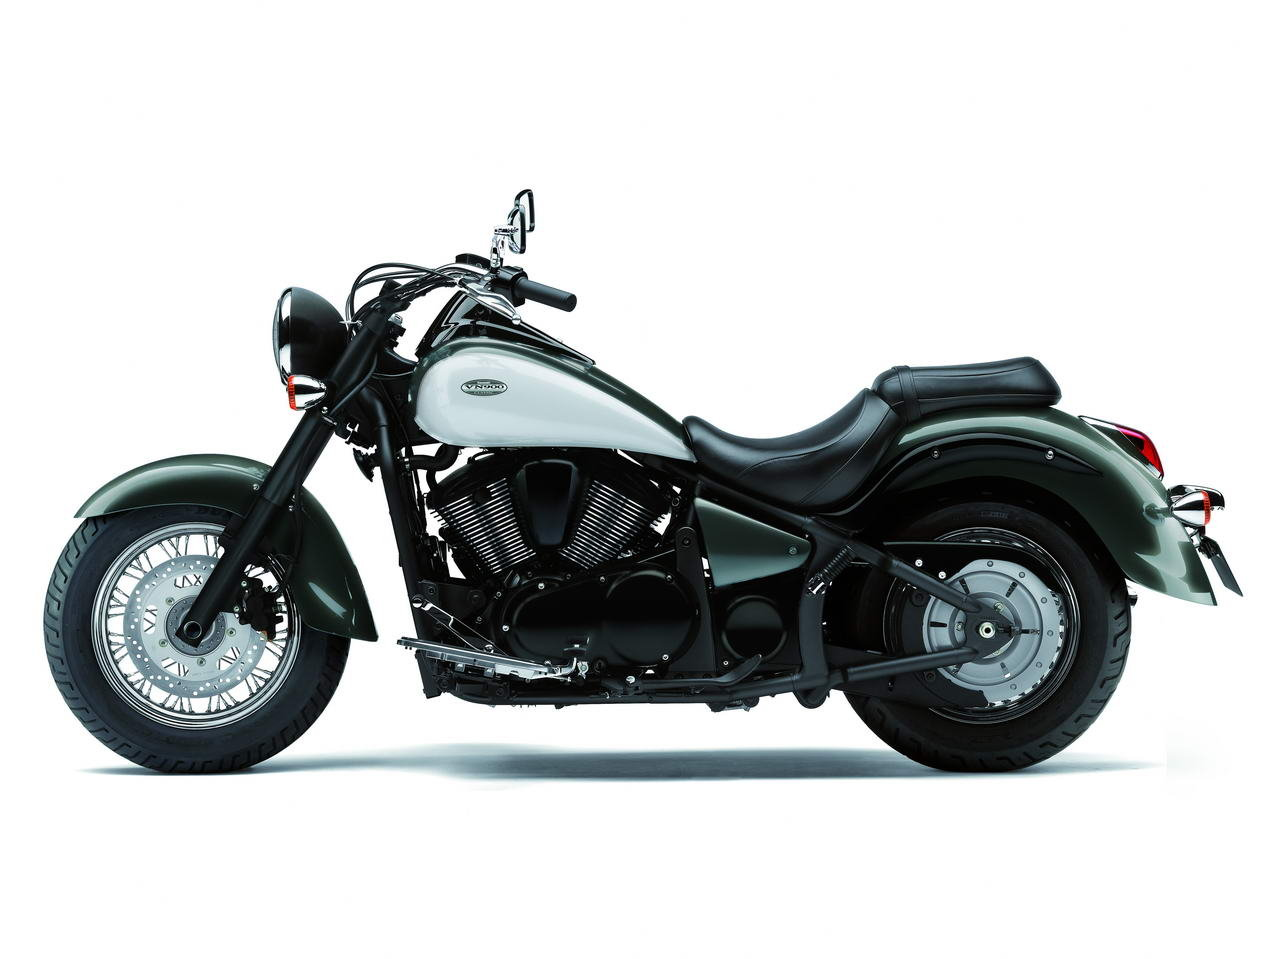 Listino Kawasaki Versys Base Granturismo on-off - image 15534_kawasaki-vn1700-voyager-custom on http://moto.motori.net